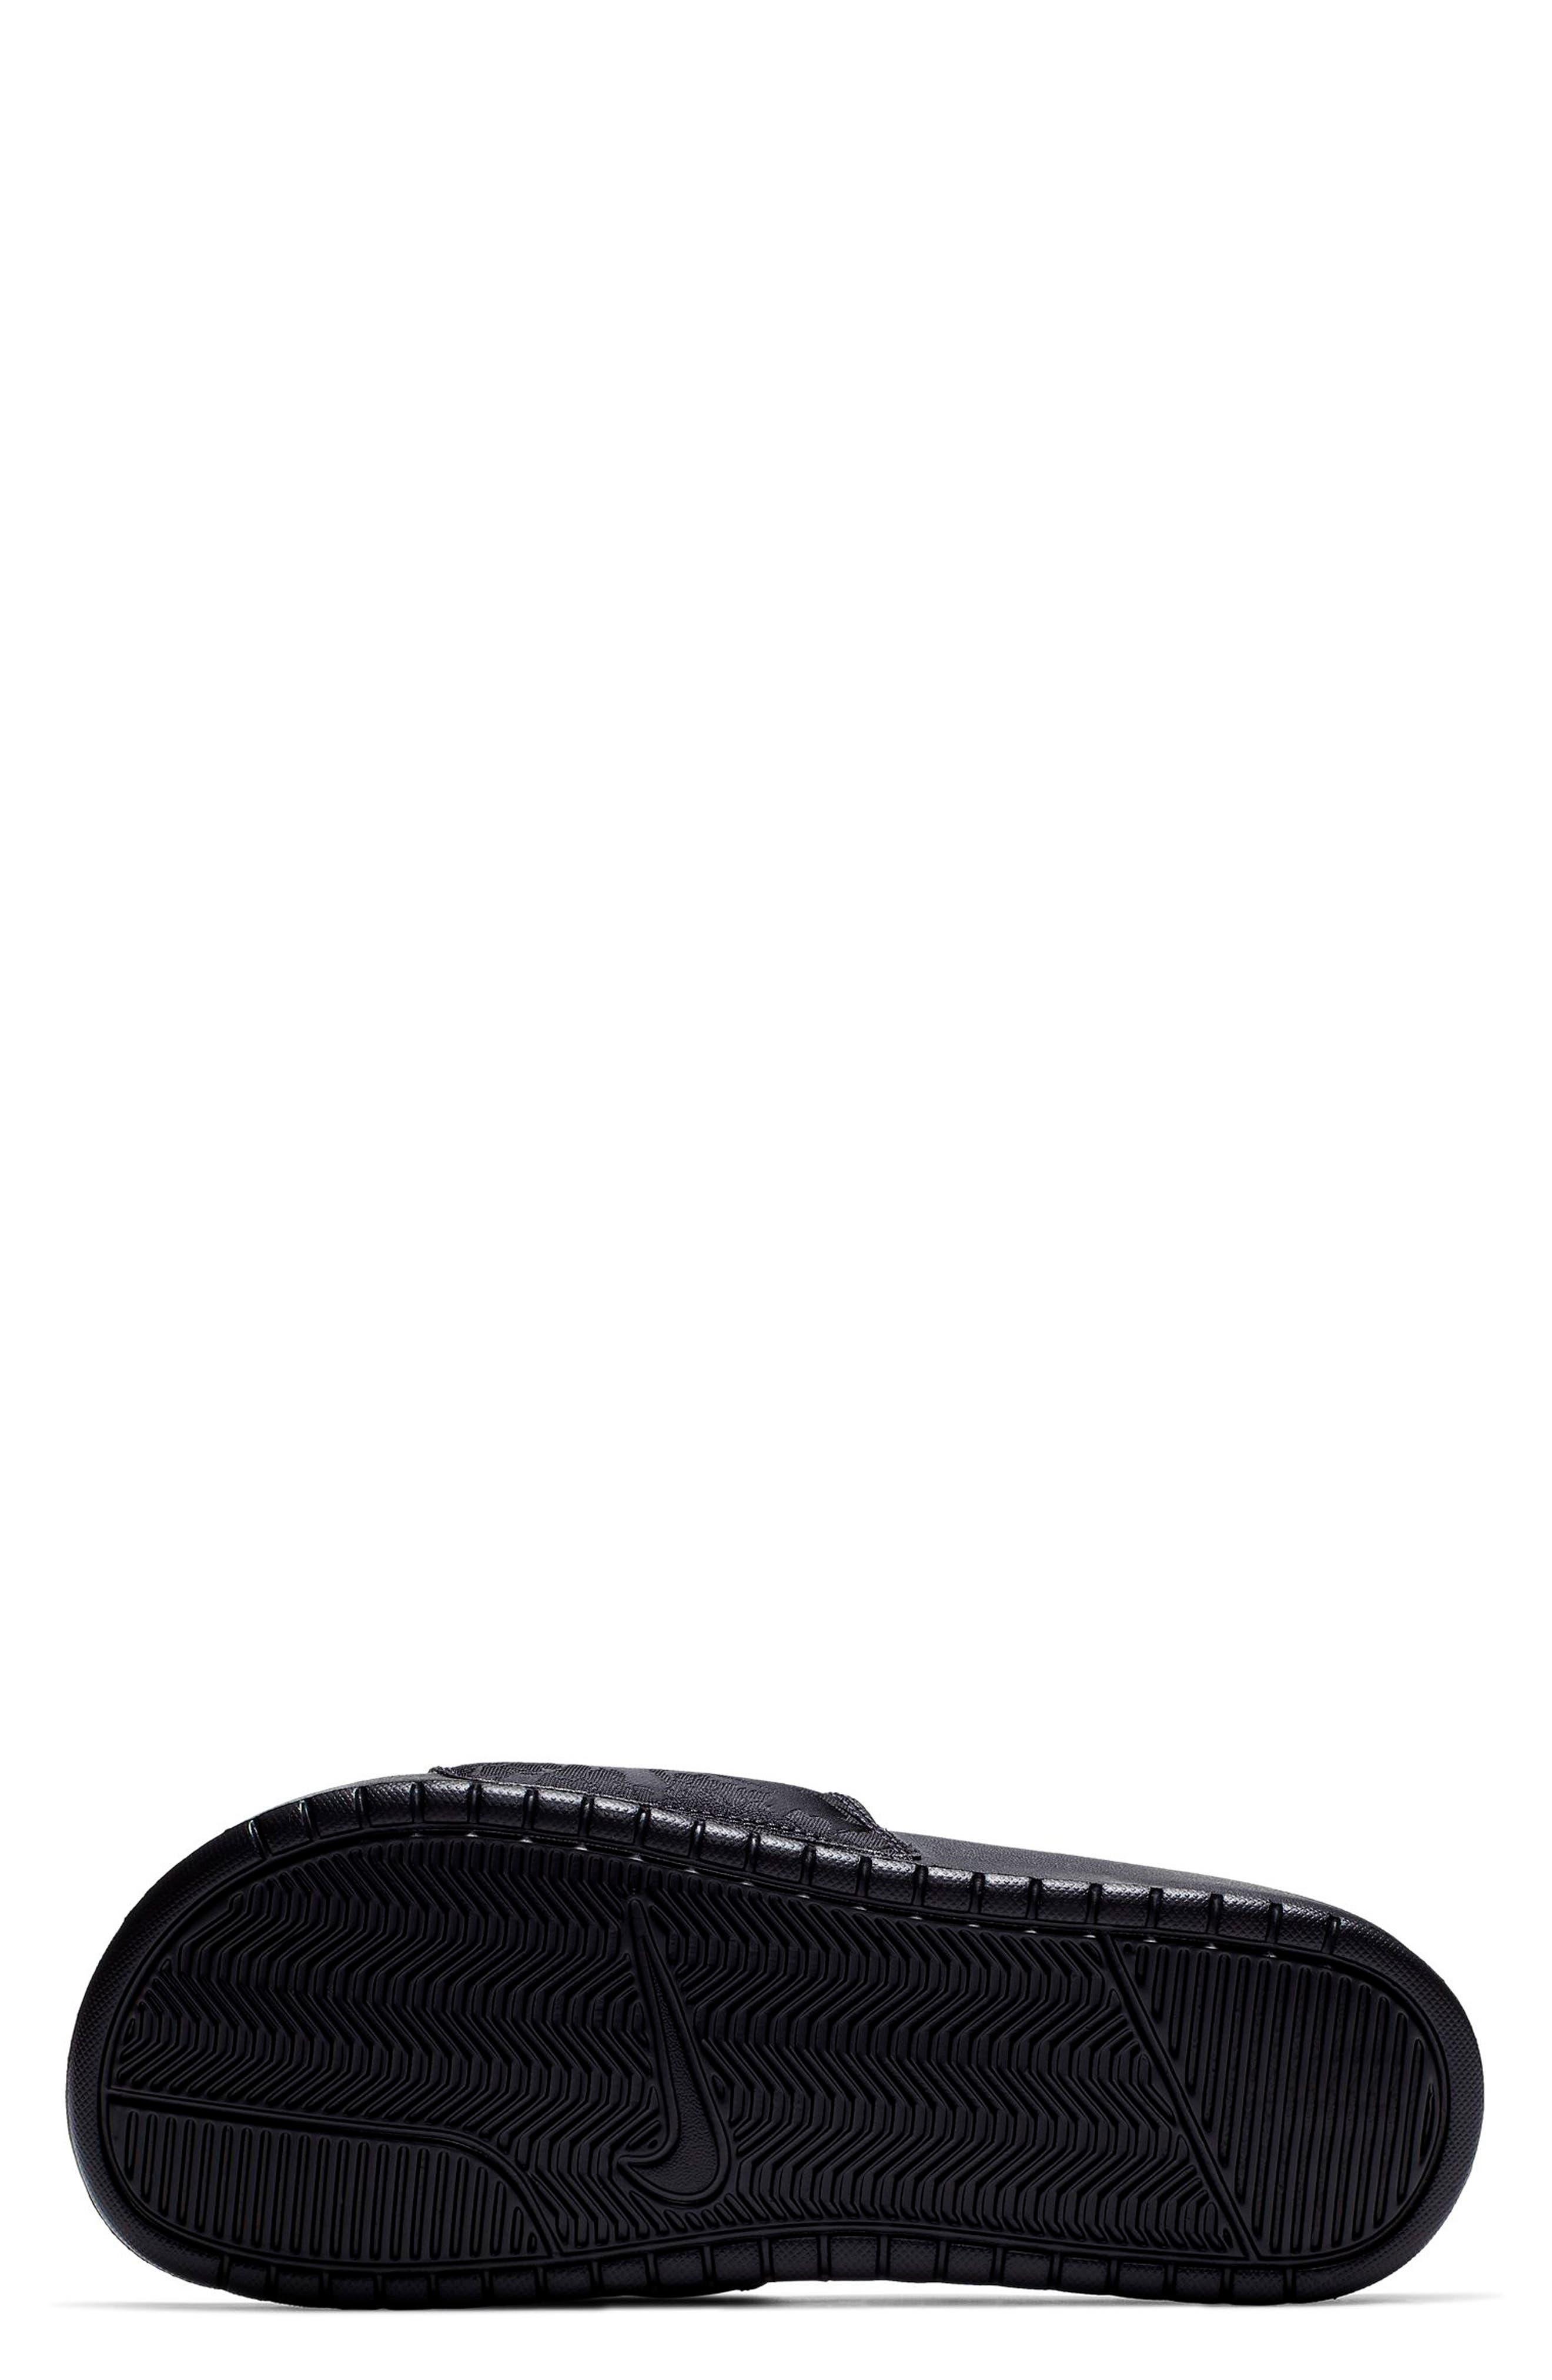 ,                             Benassi JDI Textile SE Slide Sandal,                             Alternate thumbnail 3, color,                             BLACK/ BLACK/ OIL GREY